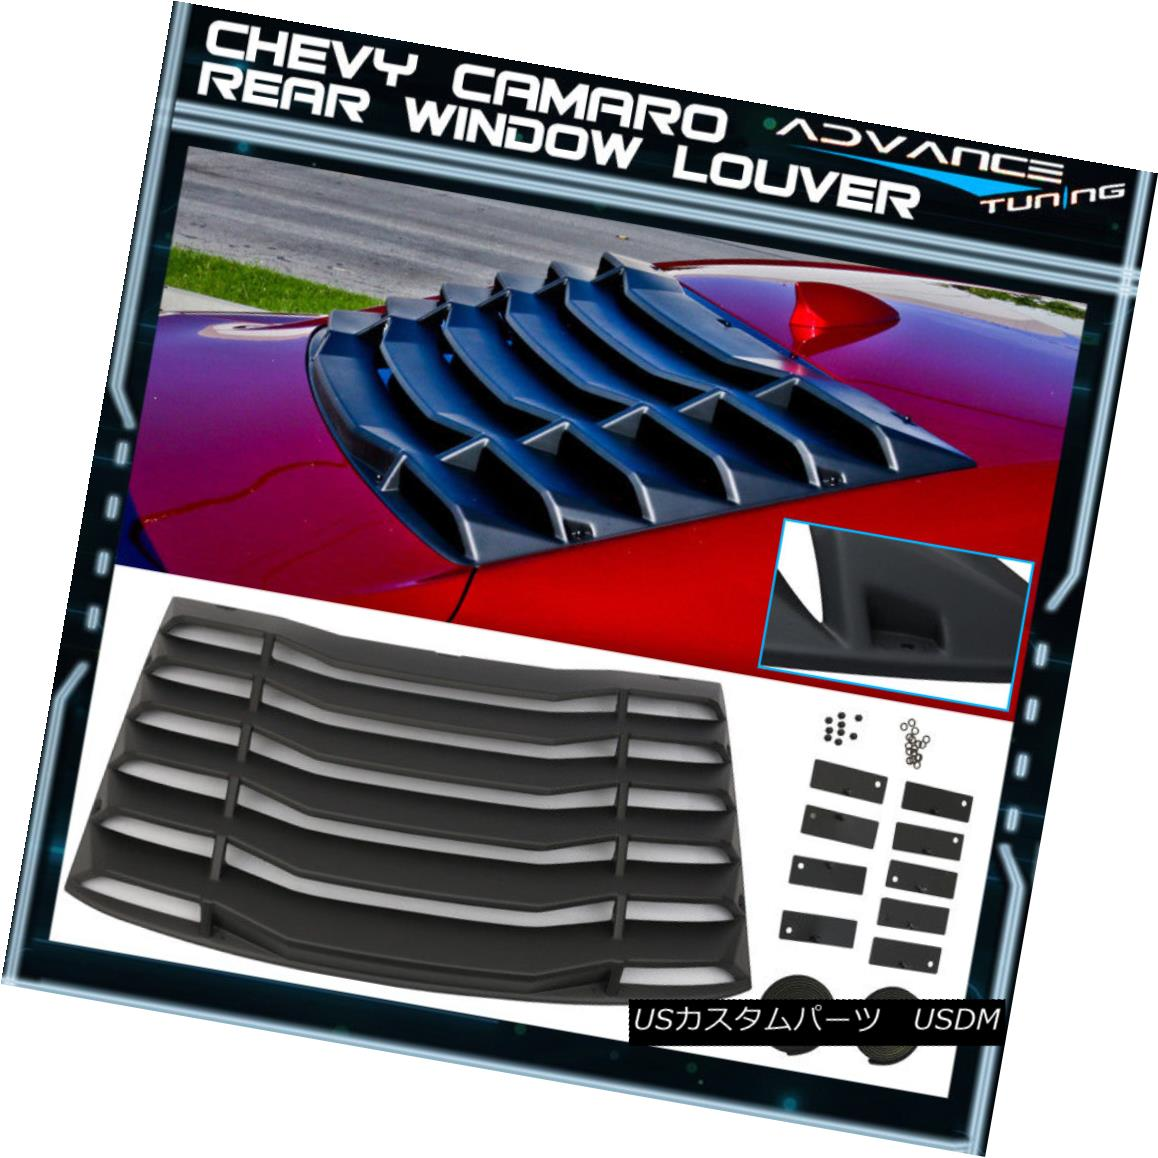 Rear エアロパーツ フィット16-17シェビーカマロIKONリアウィンドウルーバーカバーABS Louver IKON 16-17 Camaro Cover Chevy Window ABS Fits